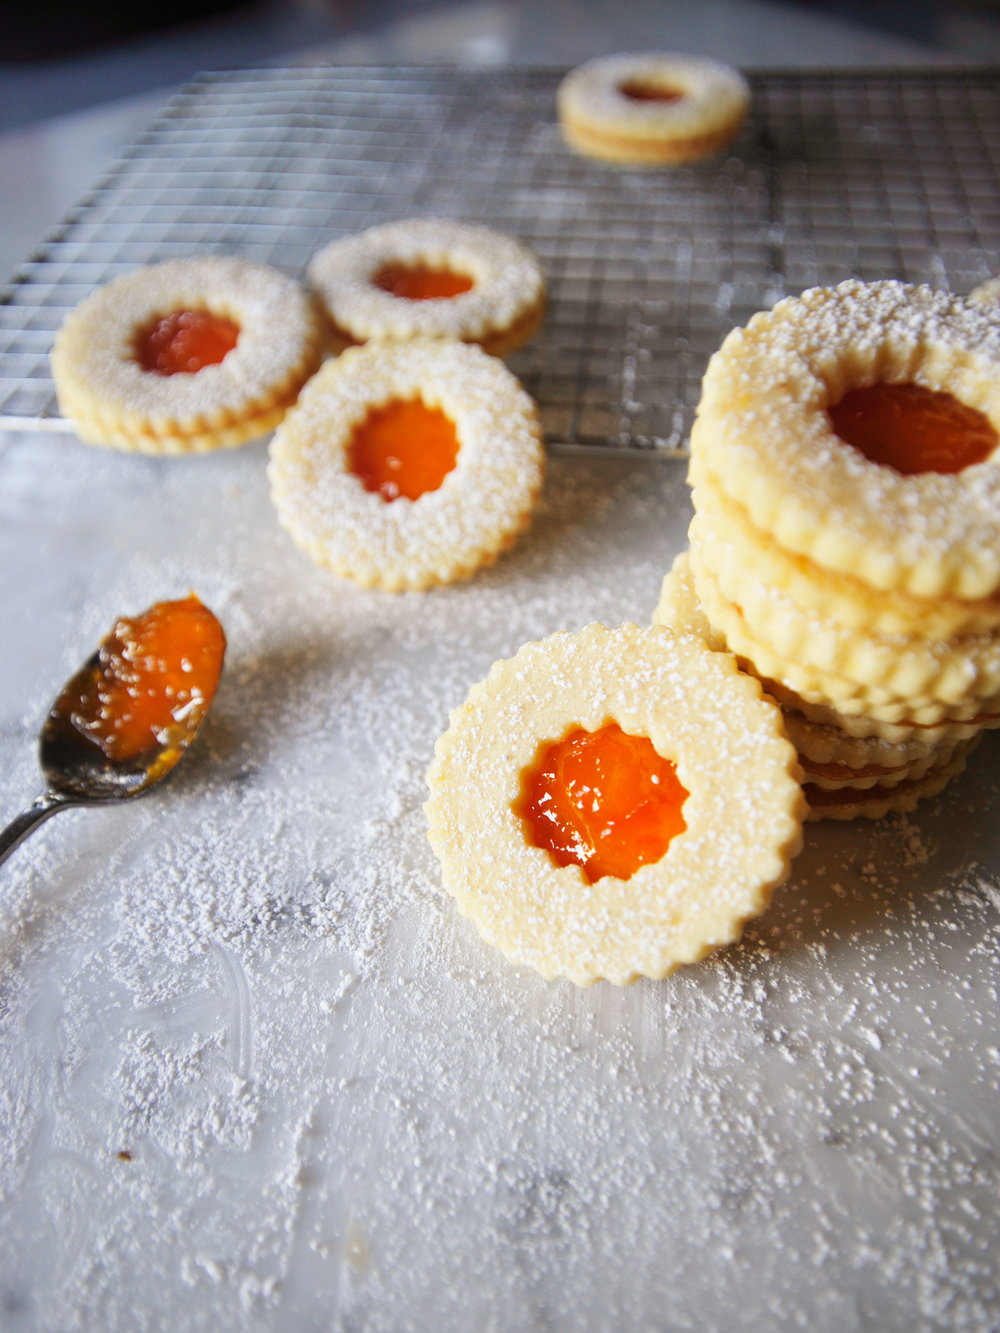 bowtiebaking-pineapple-yuzu-linzer-cookies-3